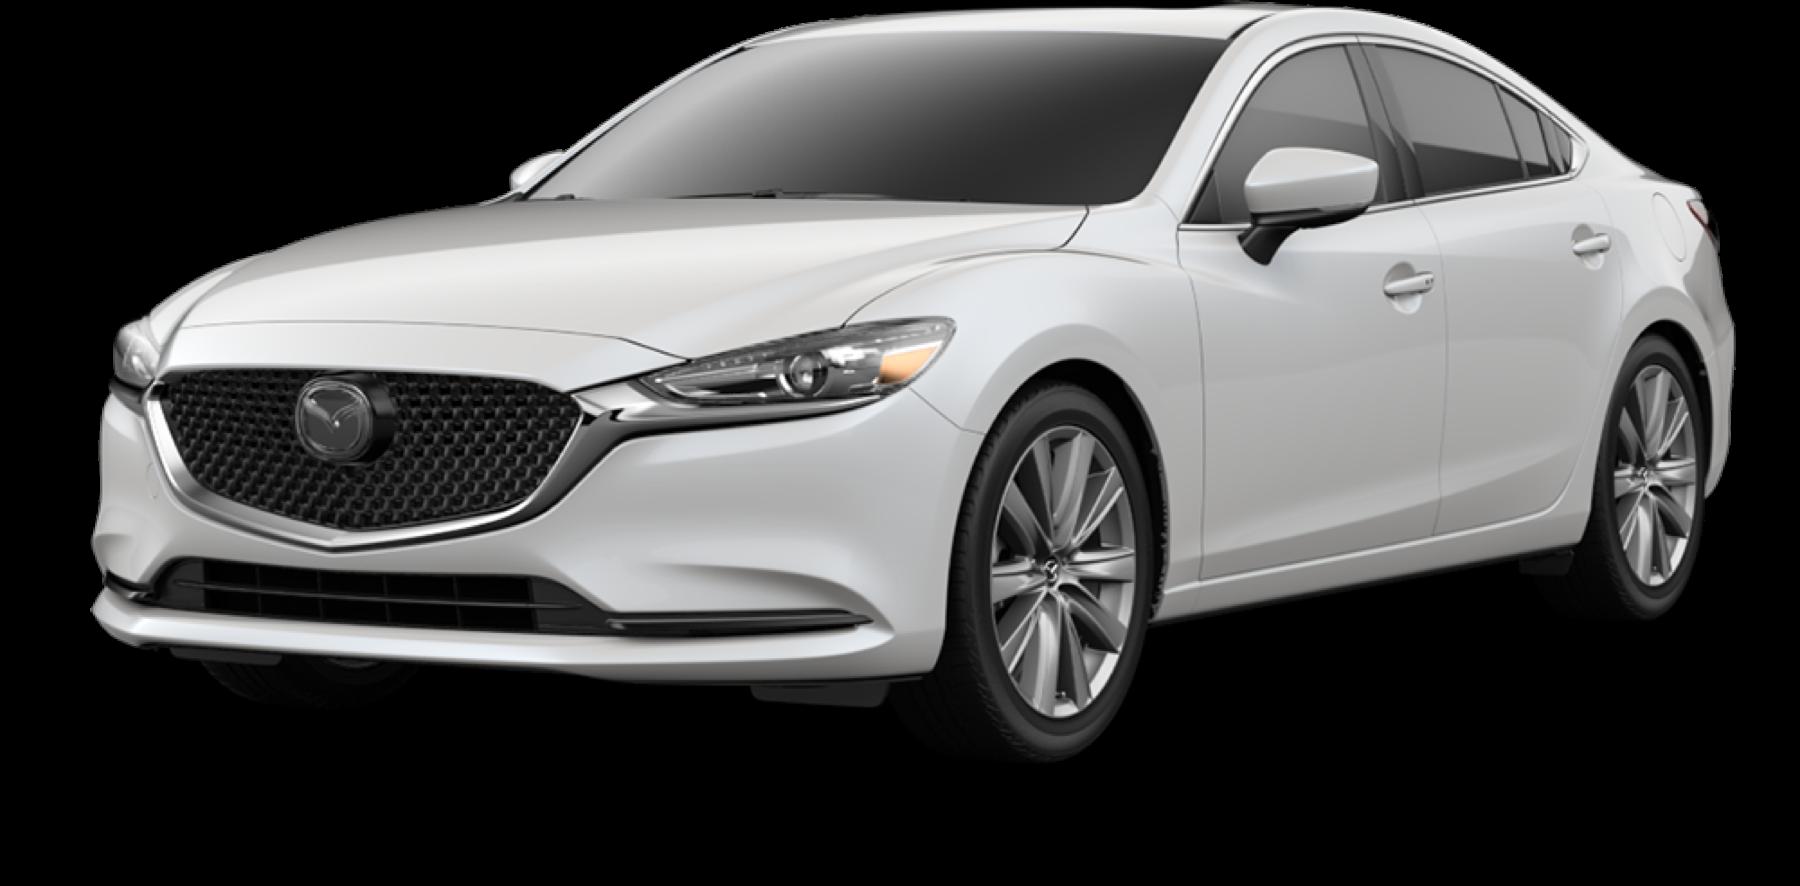 2021 Mazda6, Snowflake White Pearl Mica